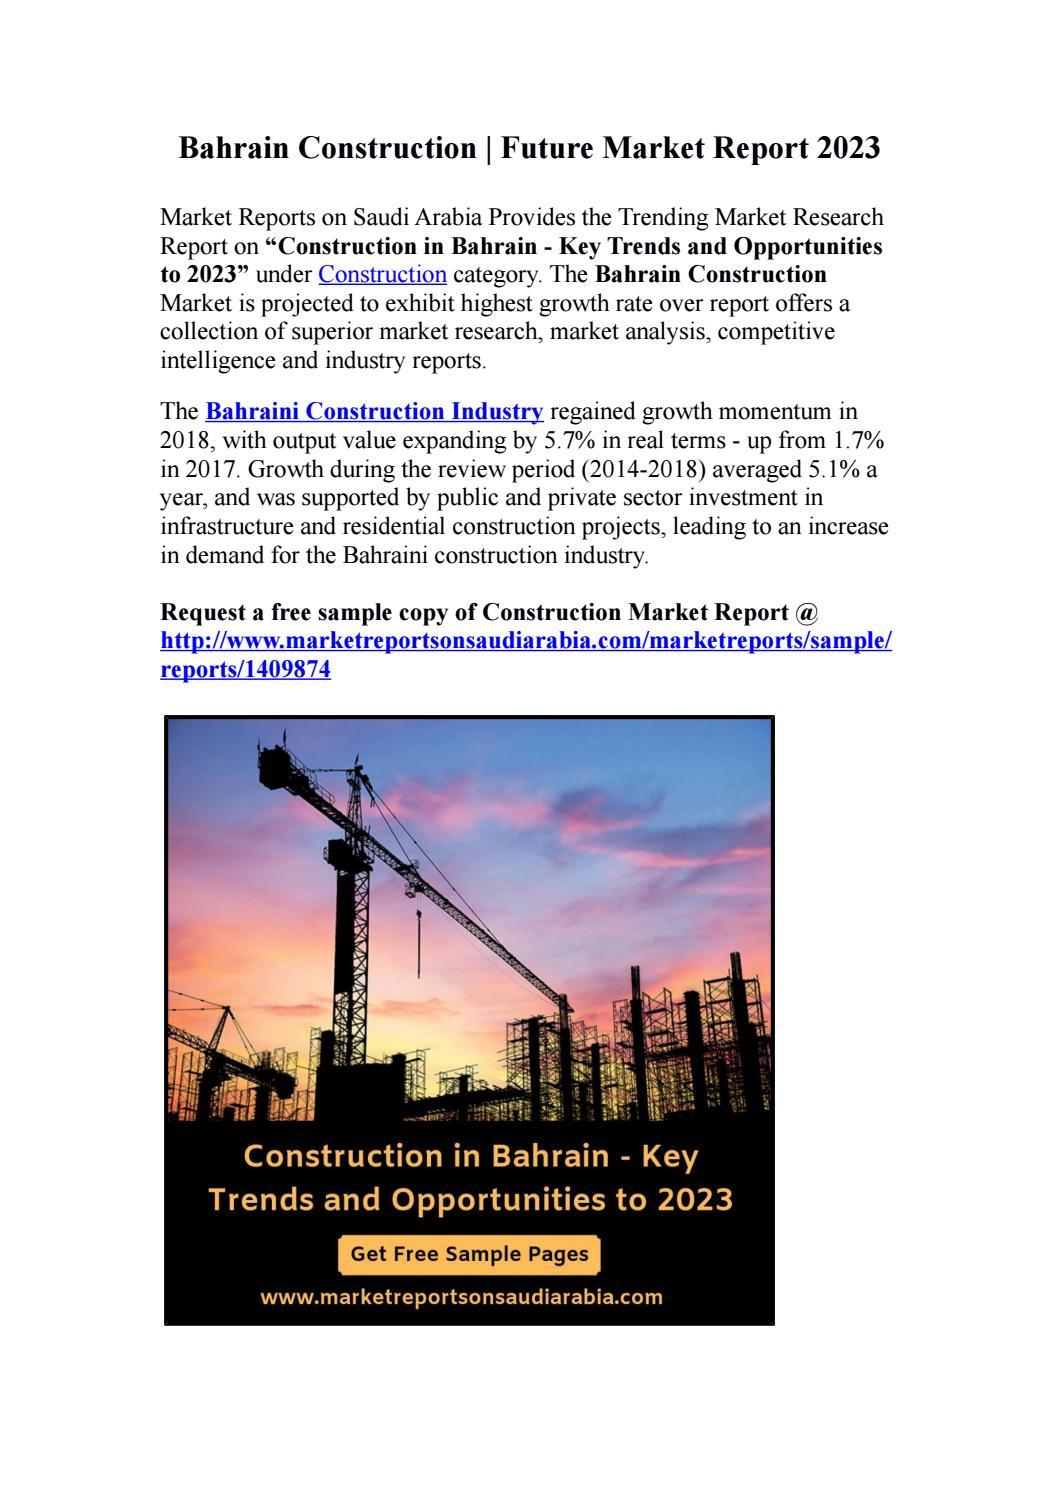 Bahrain Construction Future Market Report 2023 By